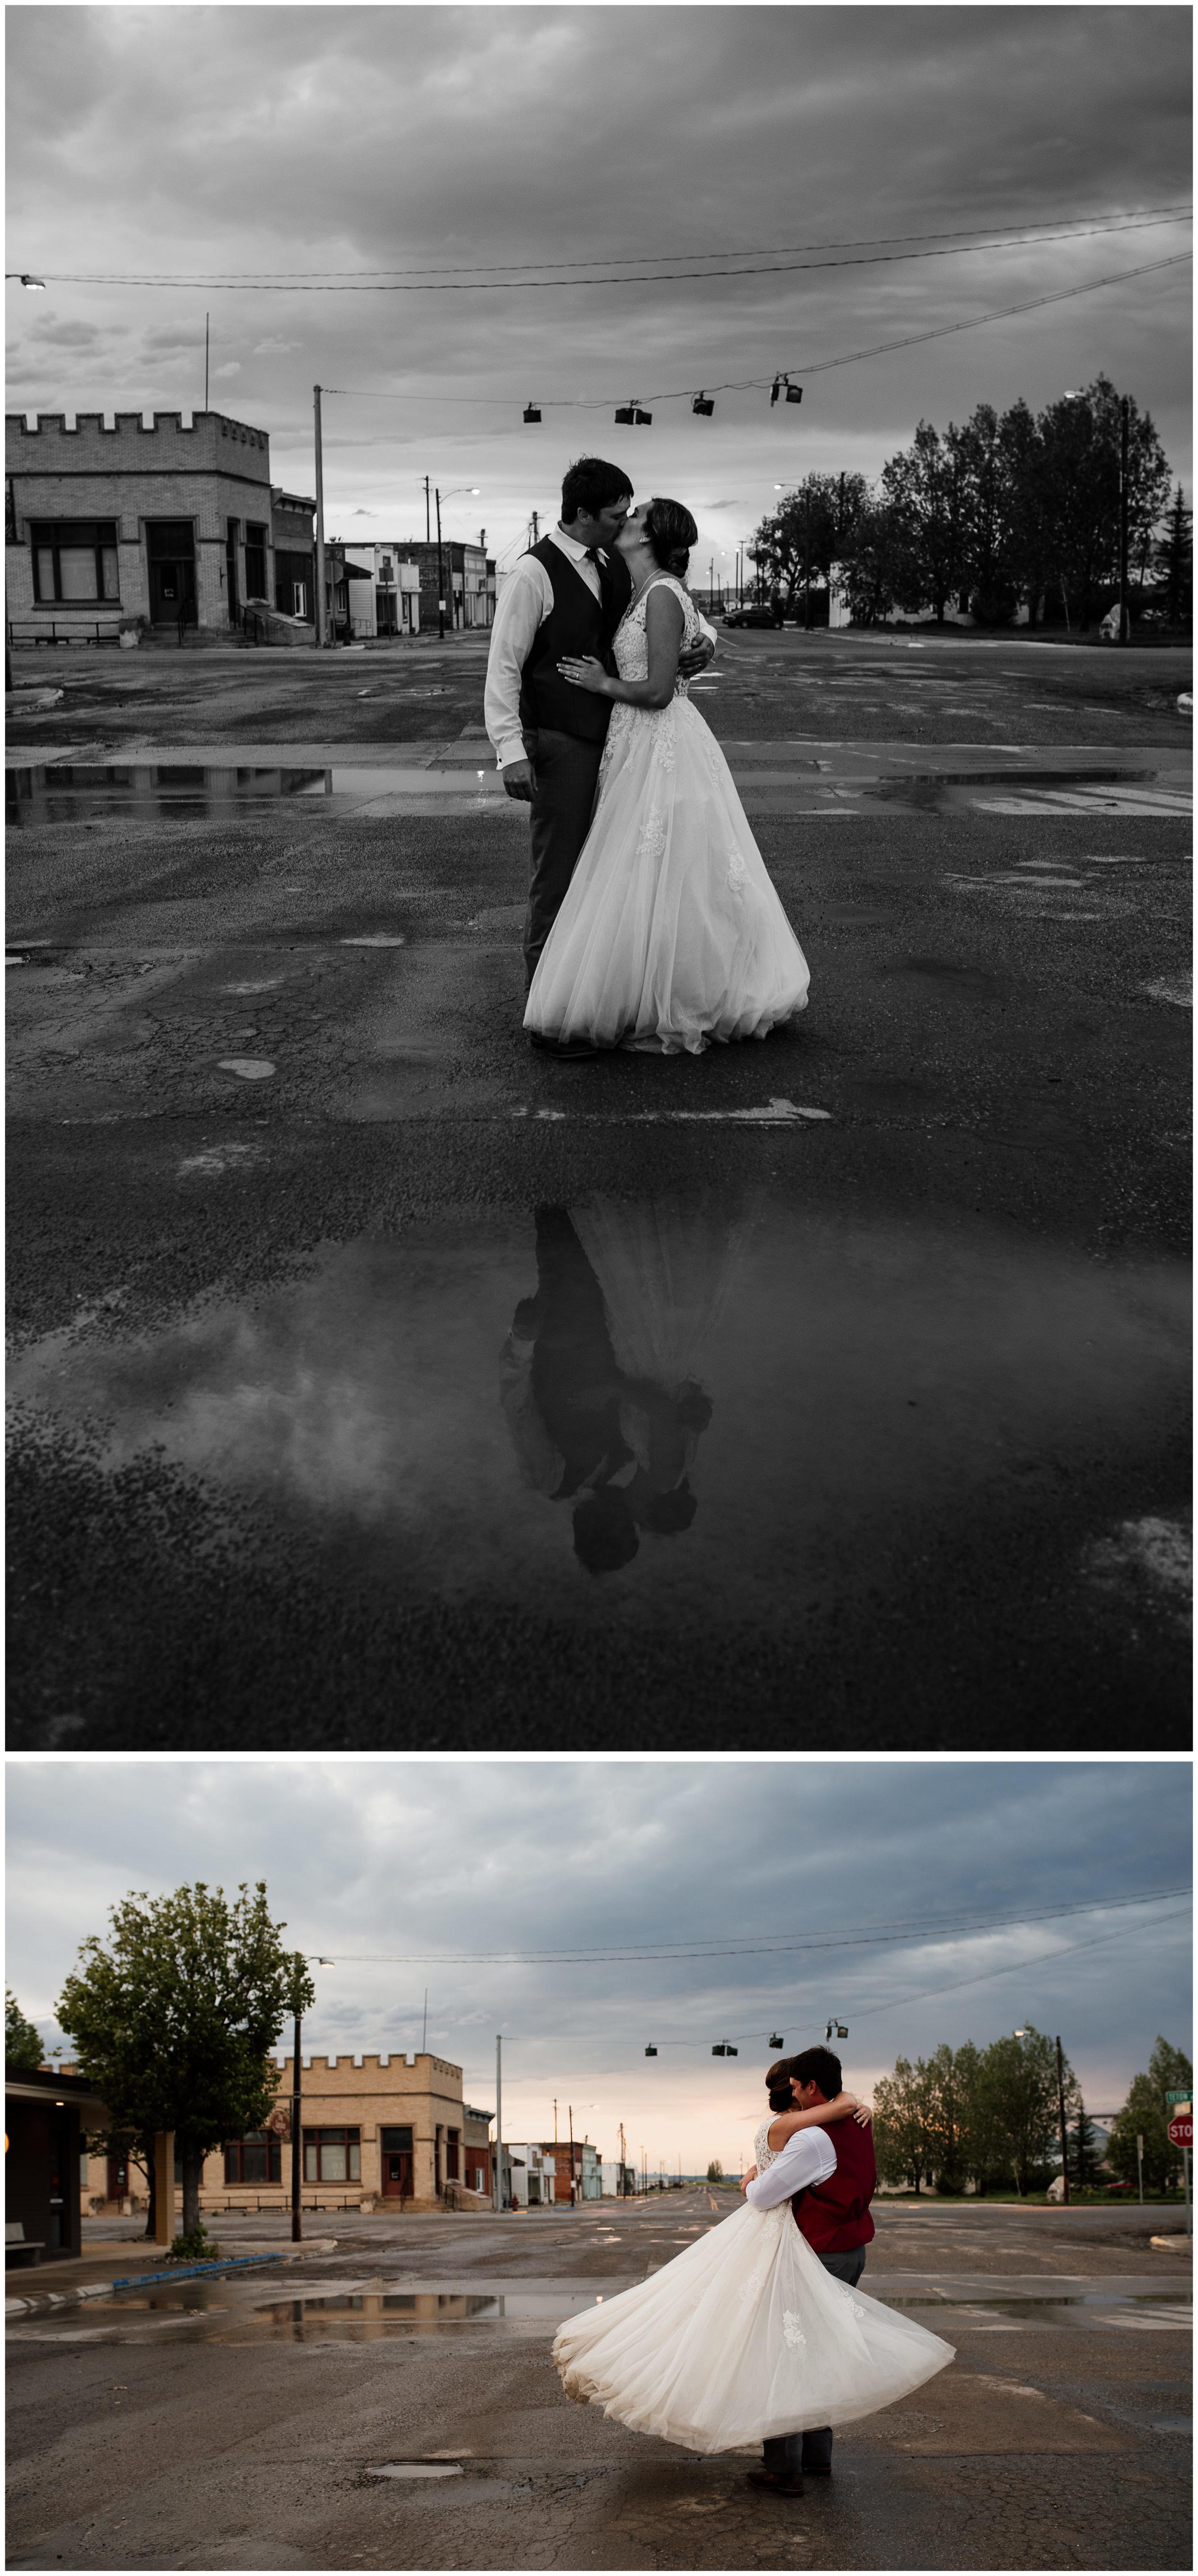 malia_clint_valier_rural_wedding_p52.jpg